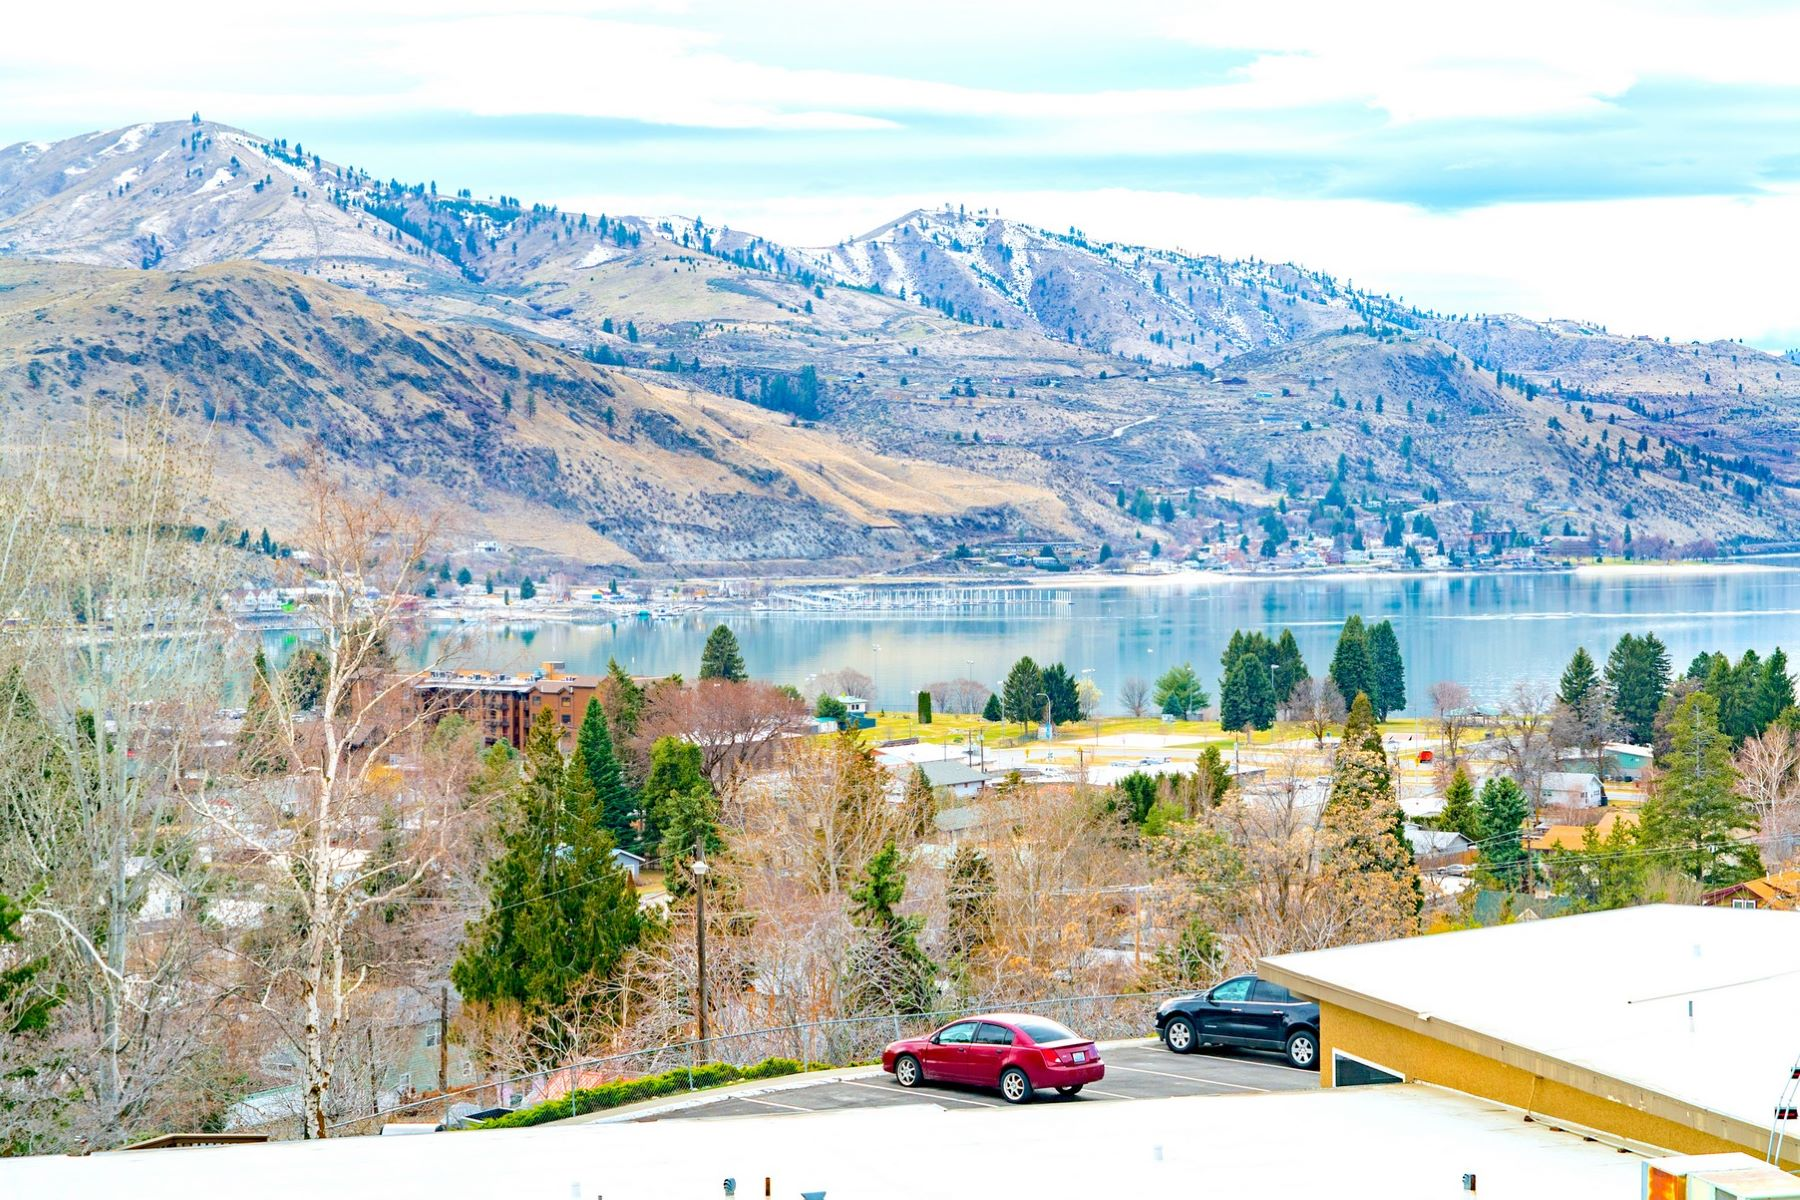 Multi-Family Home for Sale at 726 Markeson St, Chelan 726 N Markeson St Chelan, Washington 98816 United States